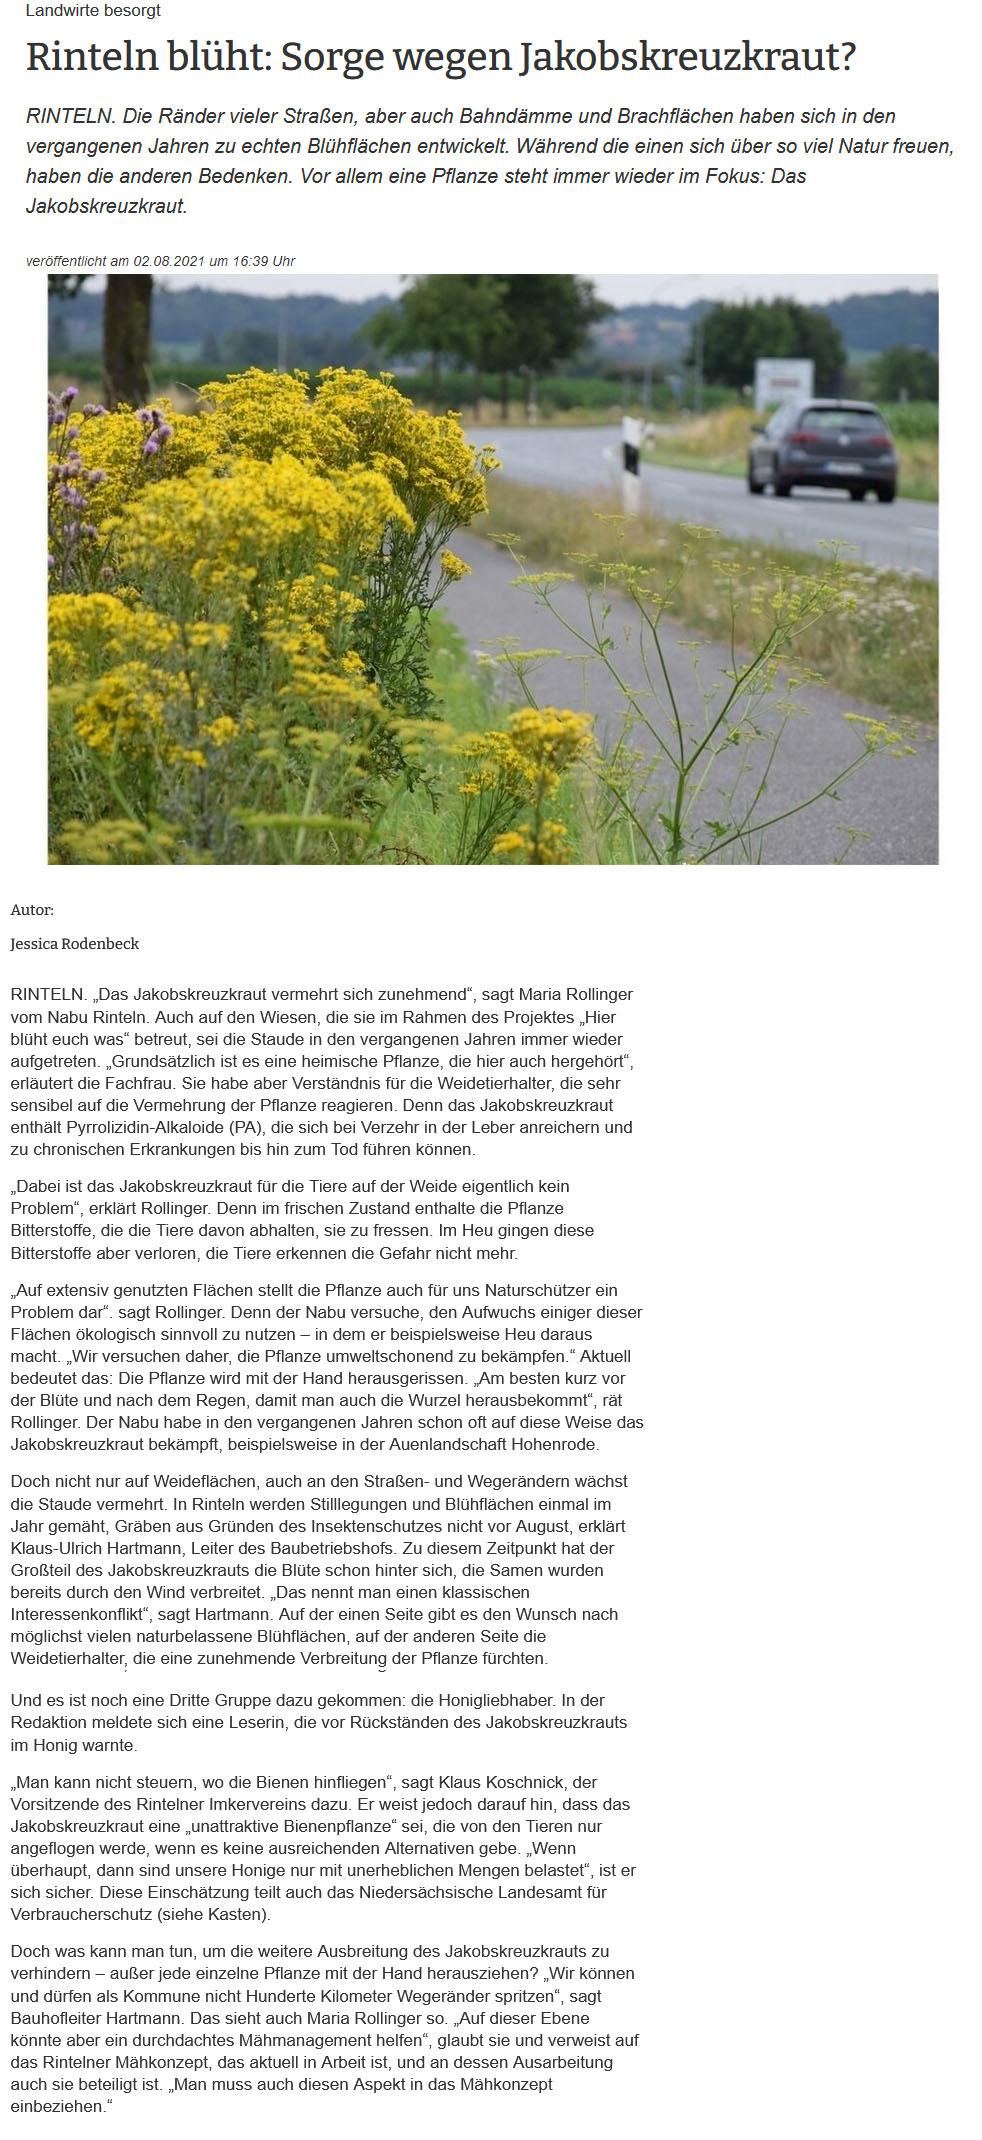 Zeitungsartikel - Rinteln blüht - Sorge wegen Jakobskreuzkraut (SZ, 02.08.2021)